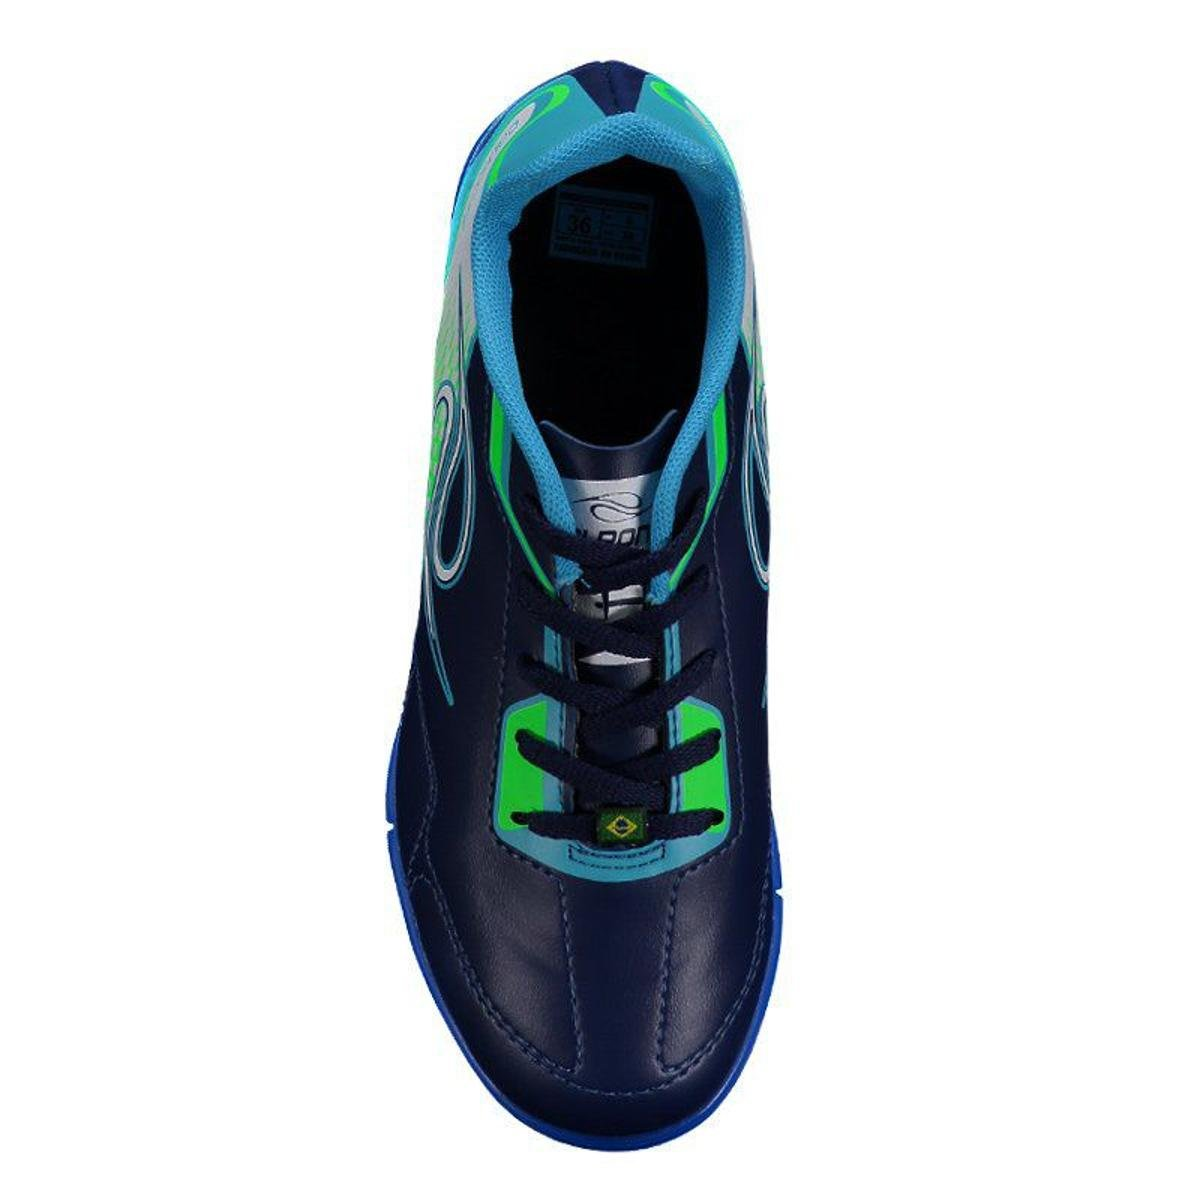 Chuteira Dalponte Class Society Juvenil - Azul - Compre Agora  1790e867446ce